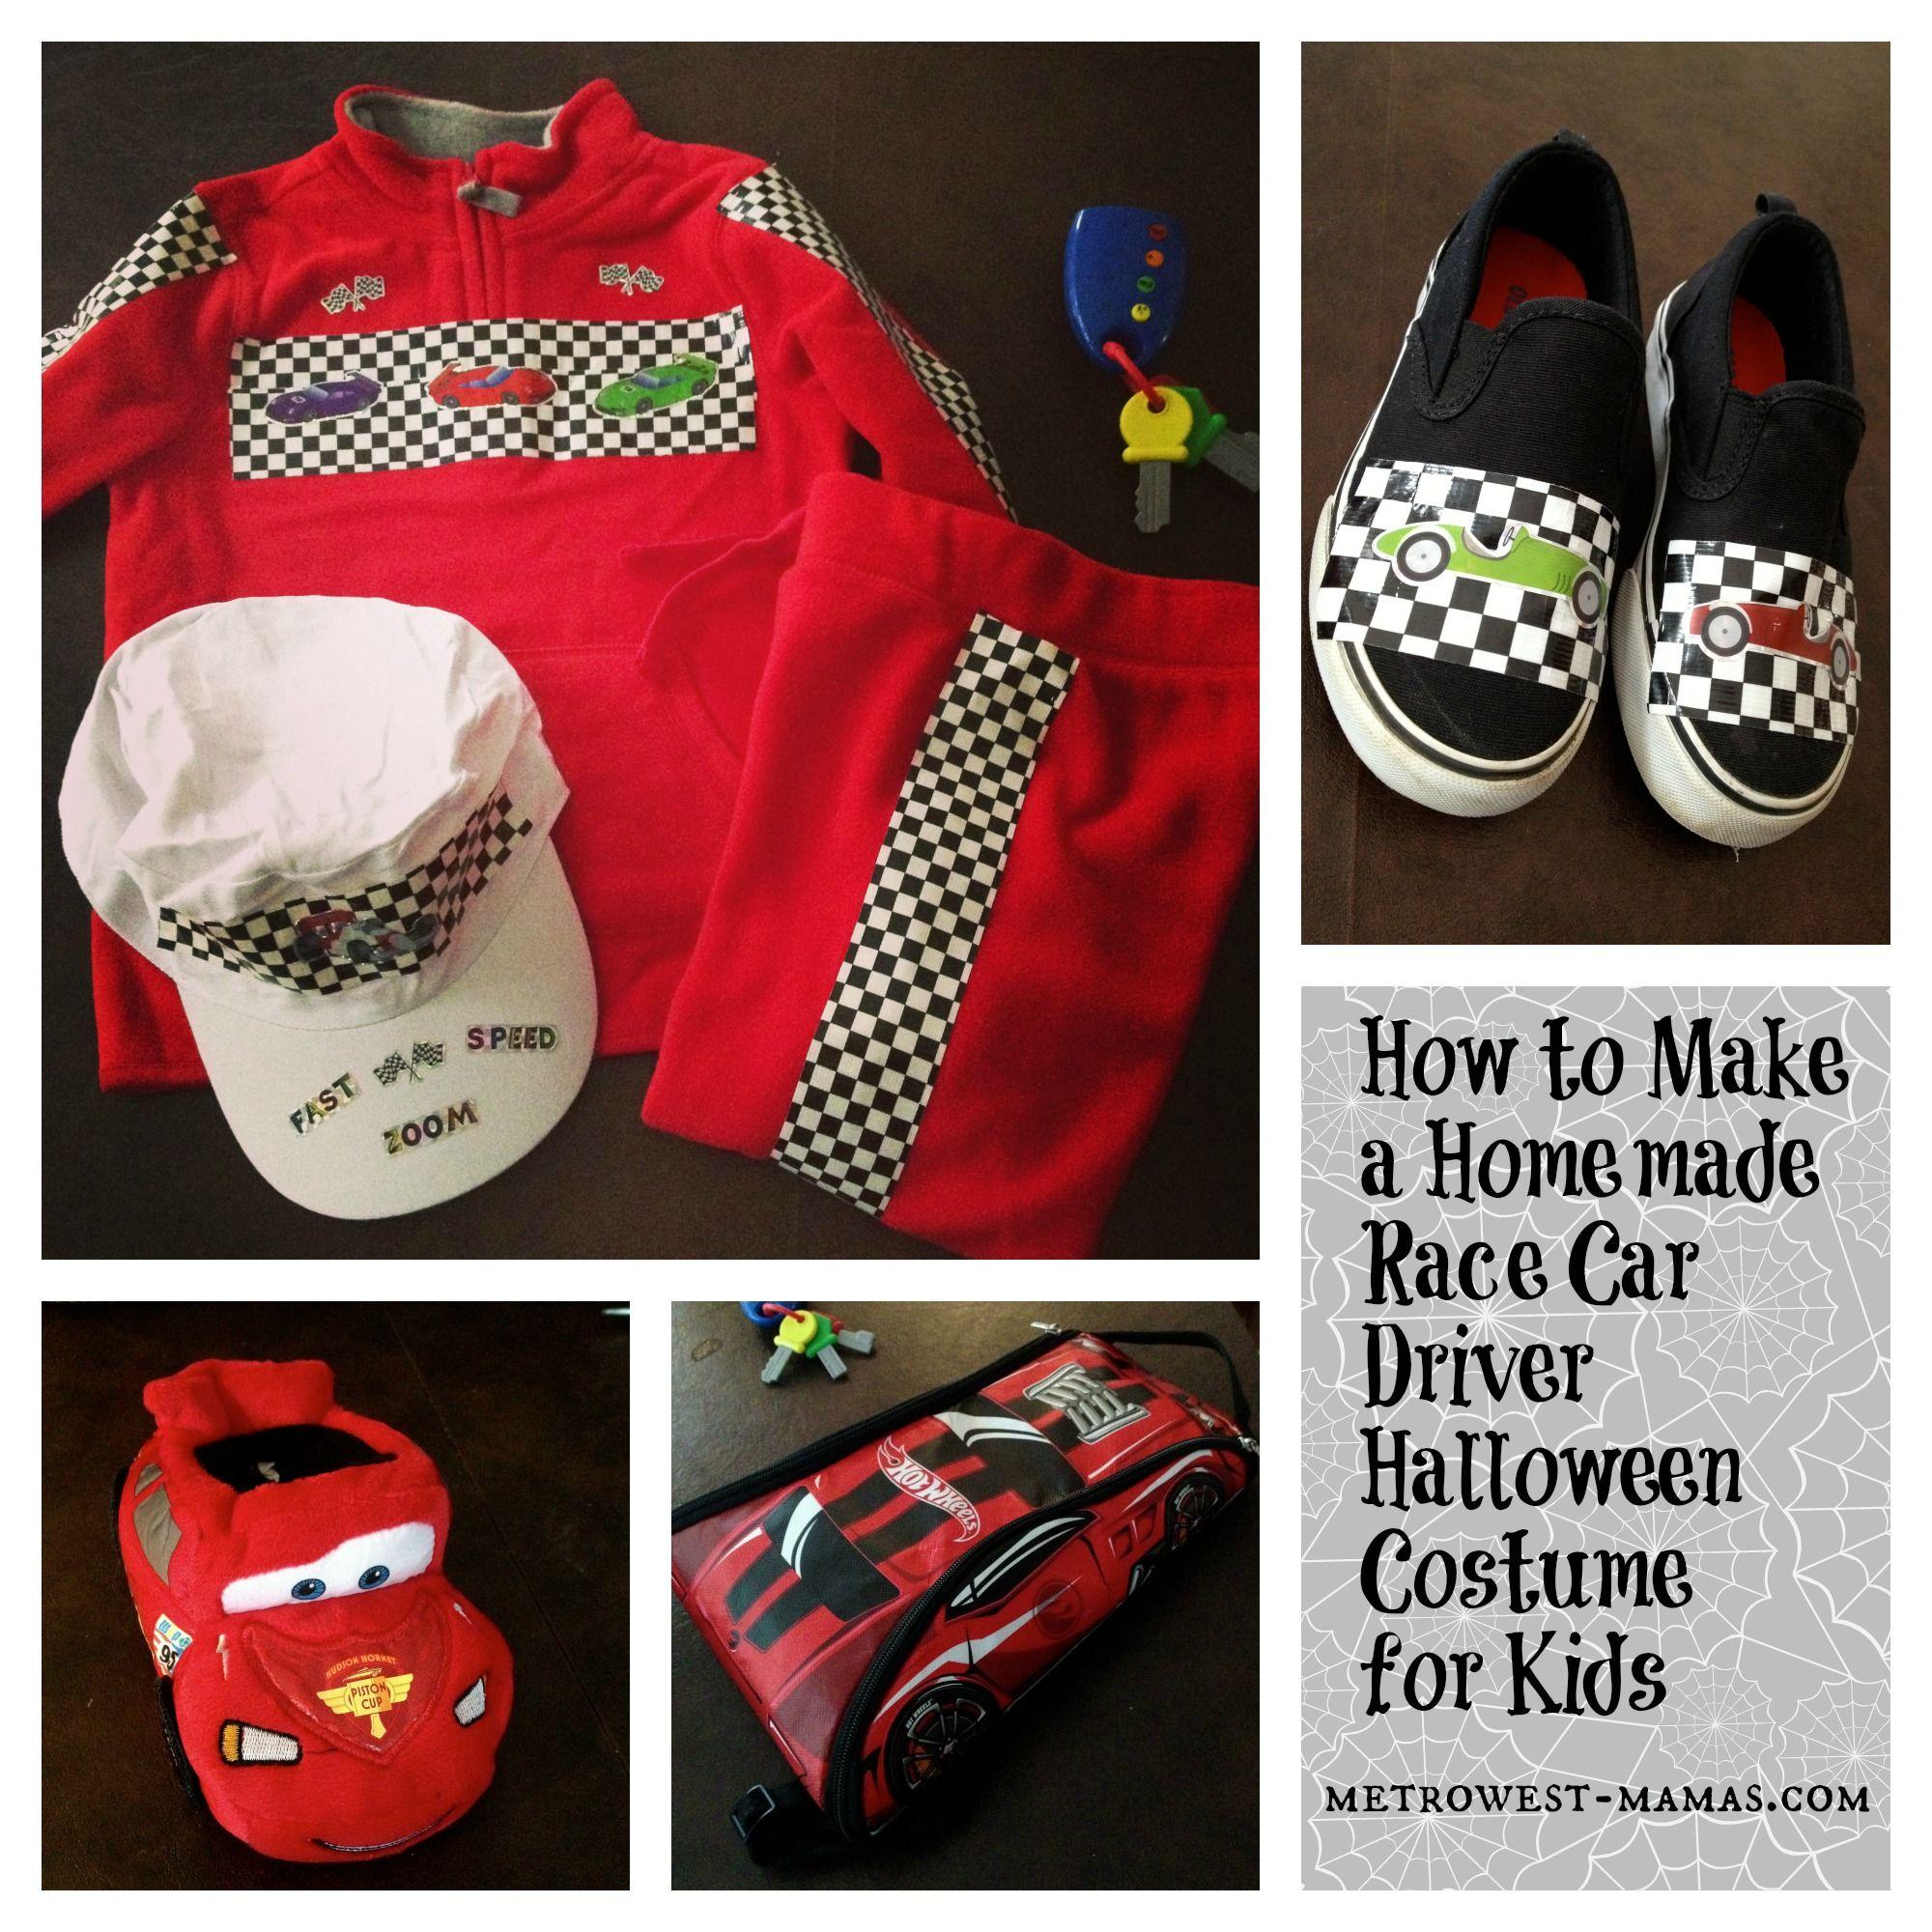 homemade race car driver halloween costume for kids